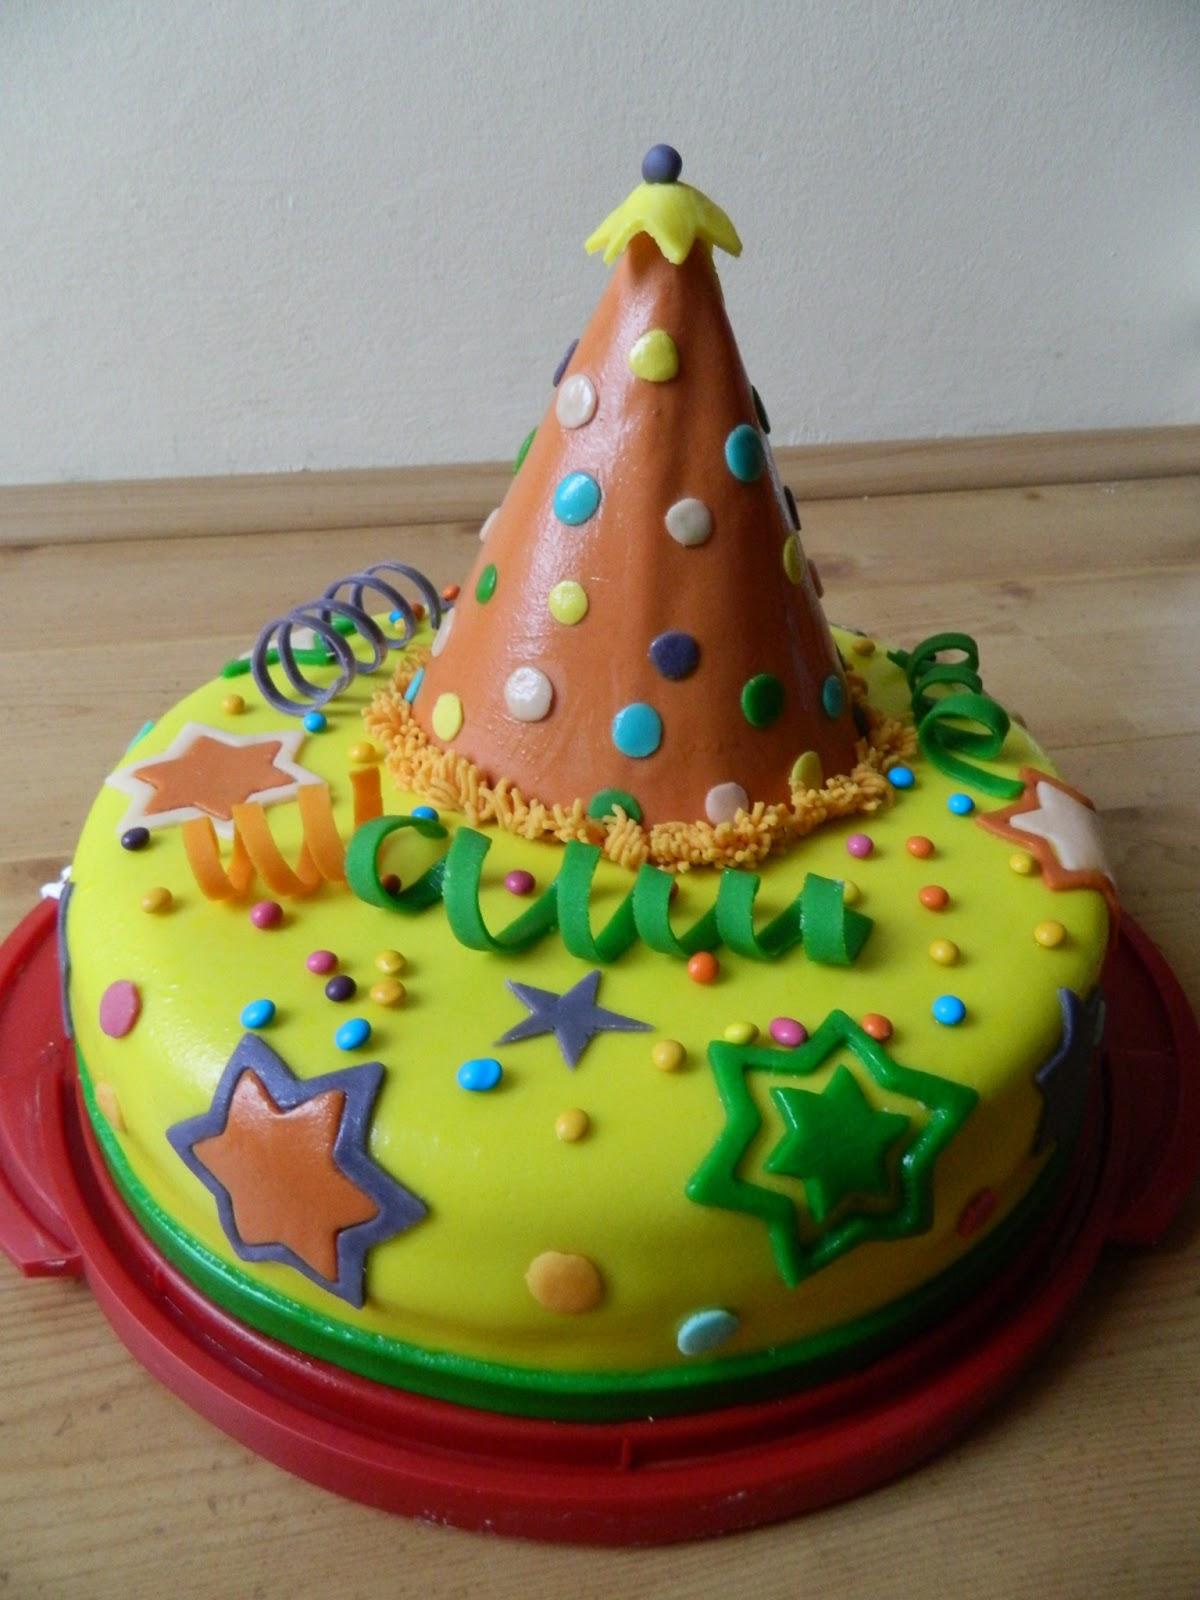 farsangi torta képek Néha sütögetek is : Farsangi torta   2013 farsangi torta képek